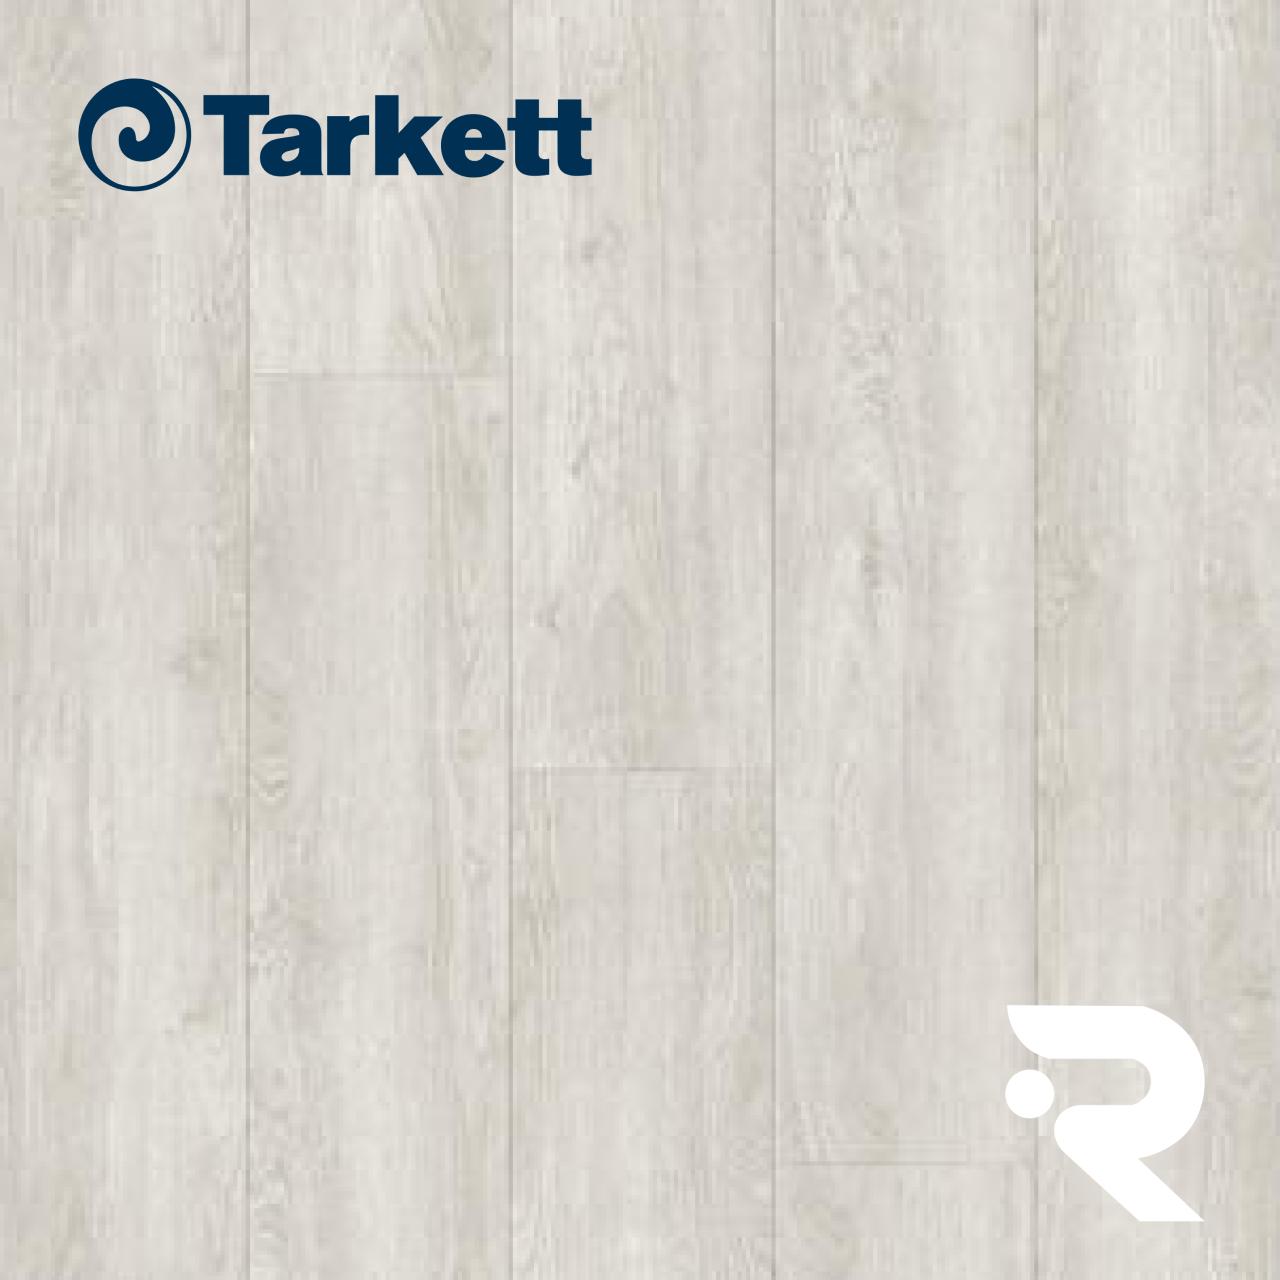 🌳 ПВХ плитка Tarkett | ModularT 7 - OAK TREND BEIGE | Art Vinyl | 1200 x 200 мм